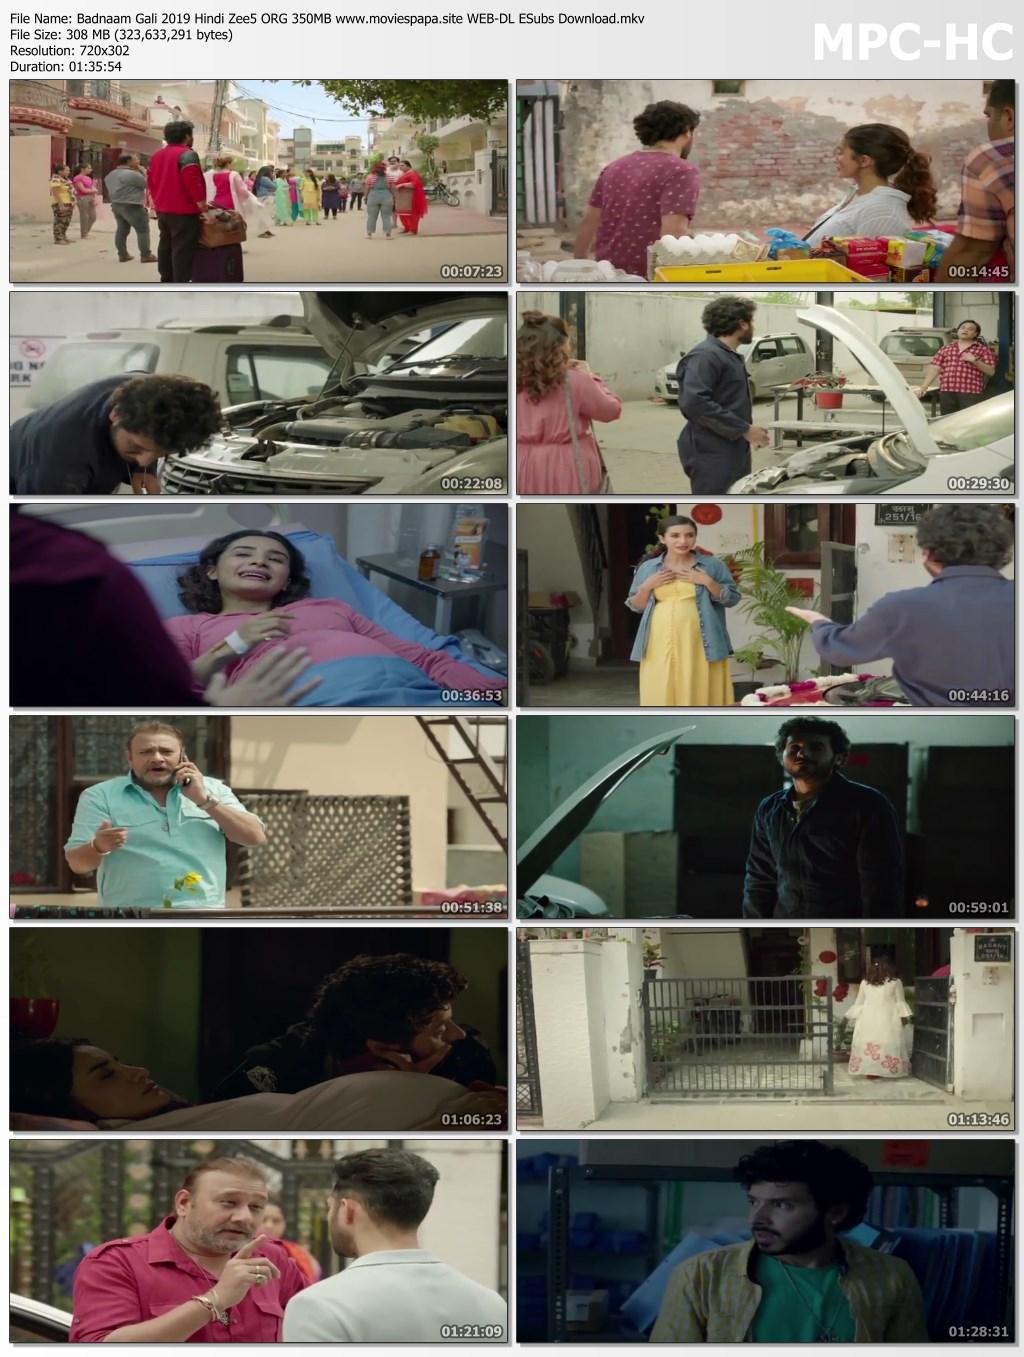 Badnaam Gali 2019 Hindi Zee5 ORG 350MB WEB-DL ESubs Download